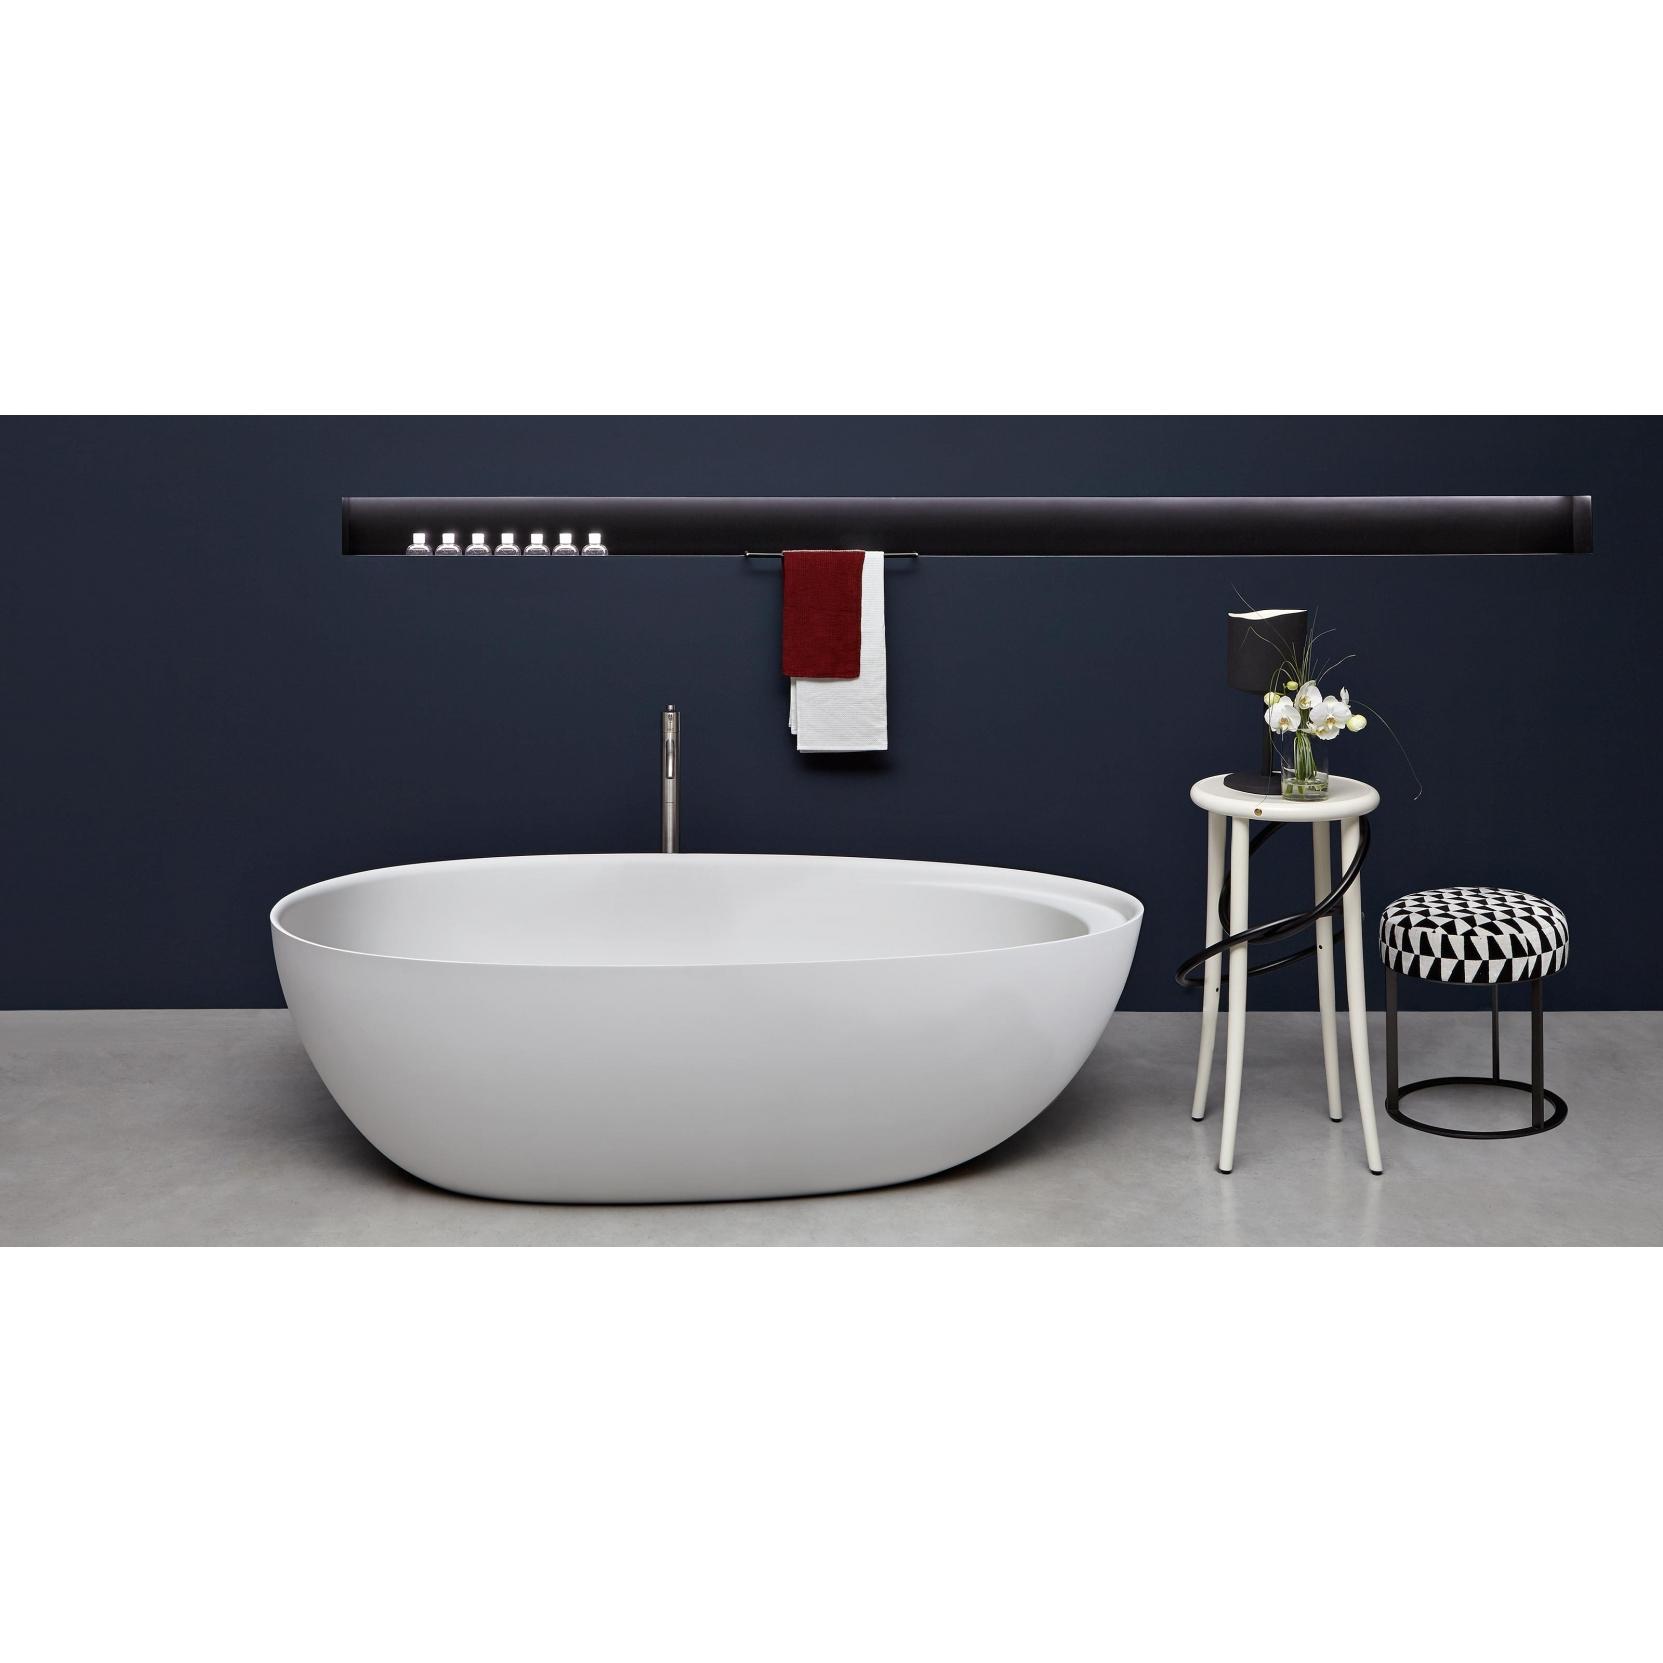 antonio lupi eclipse vasca in cristalplant tattahome. Black Bedroom Furniture Sets. Home Design Ideas